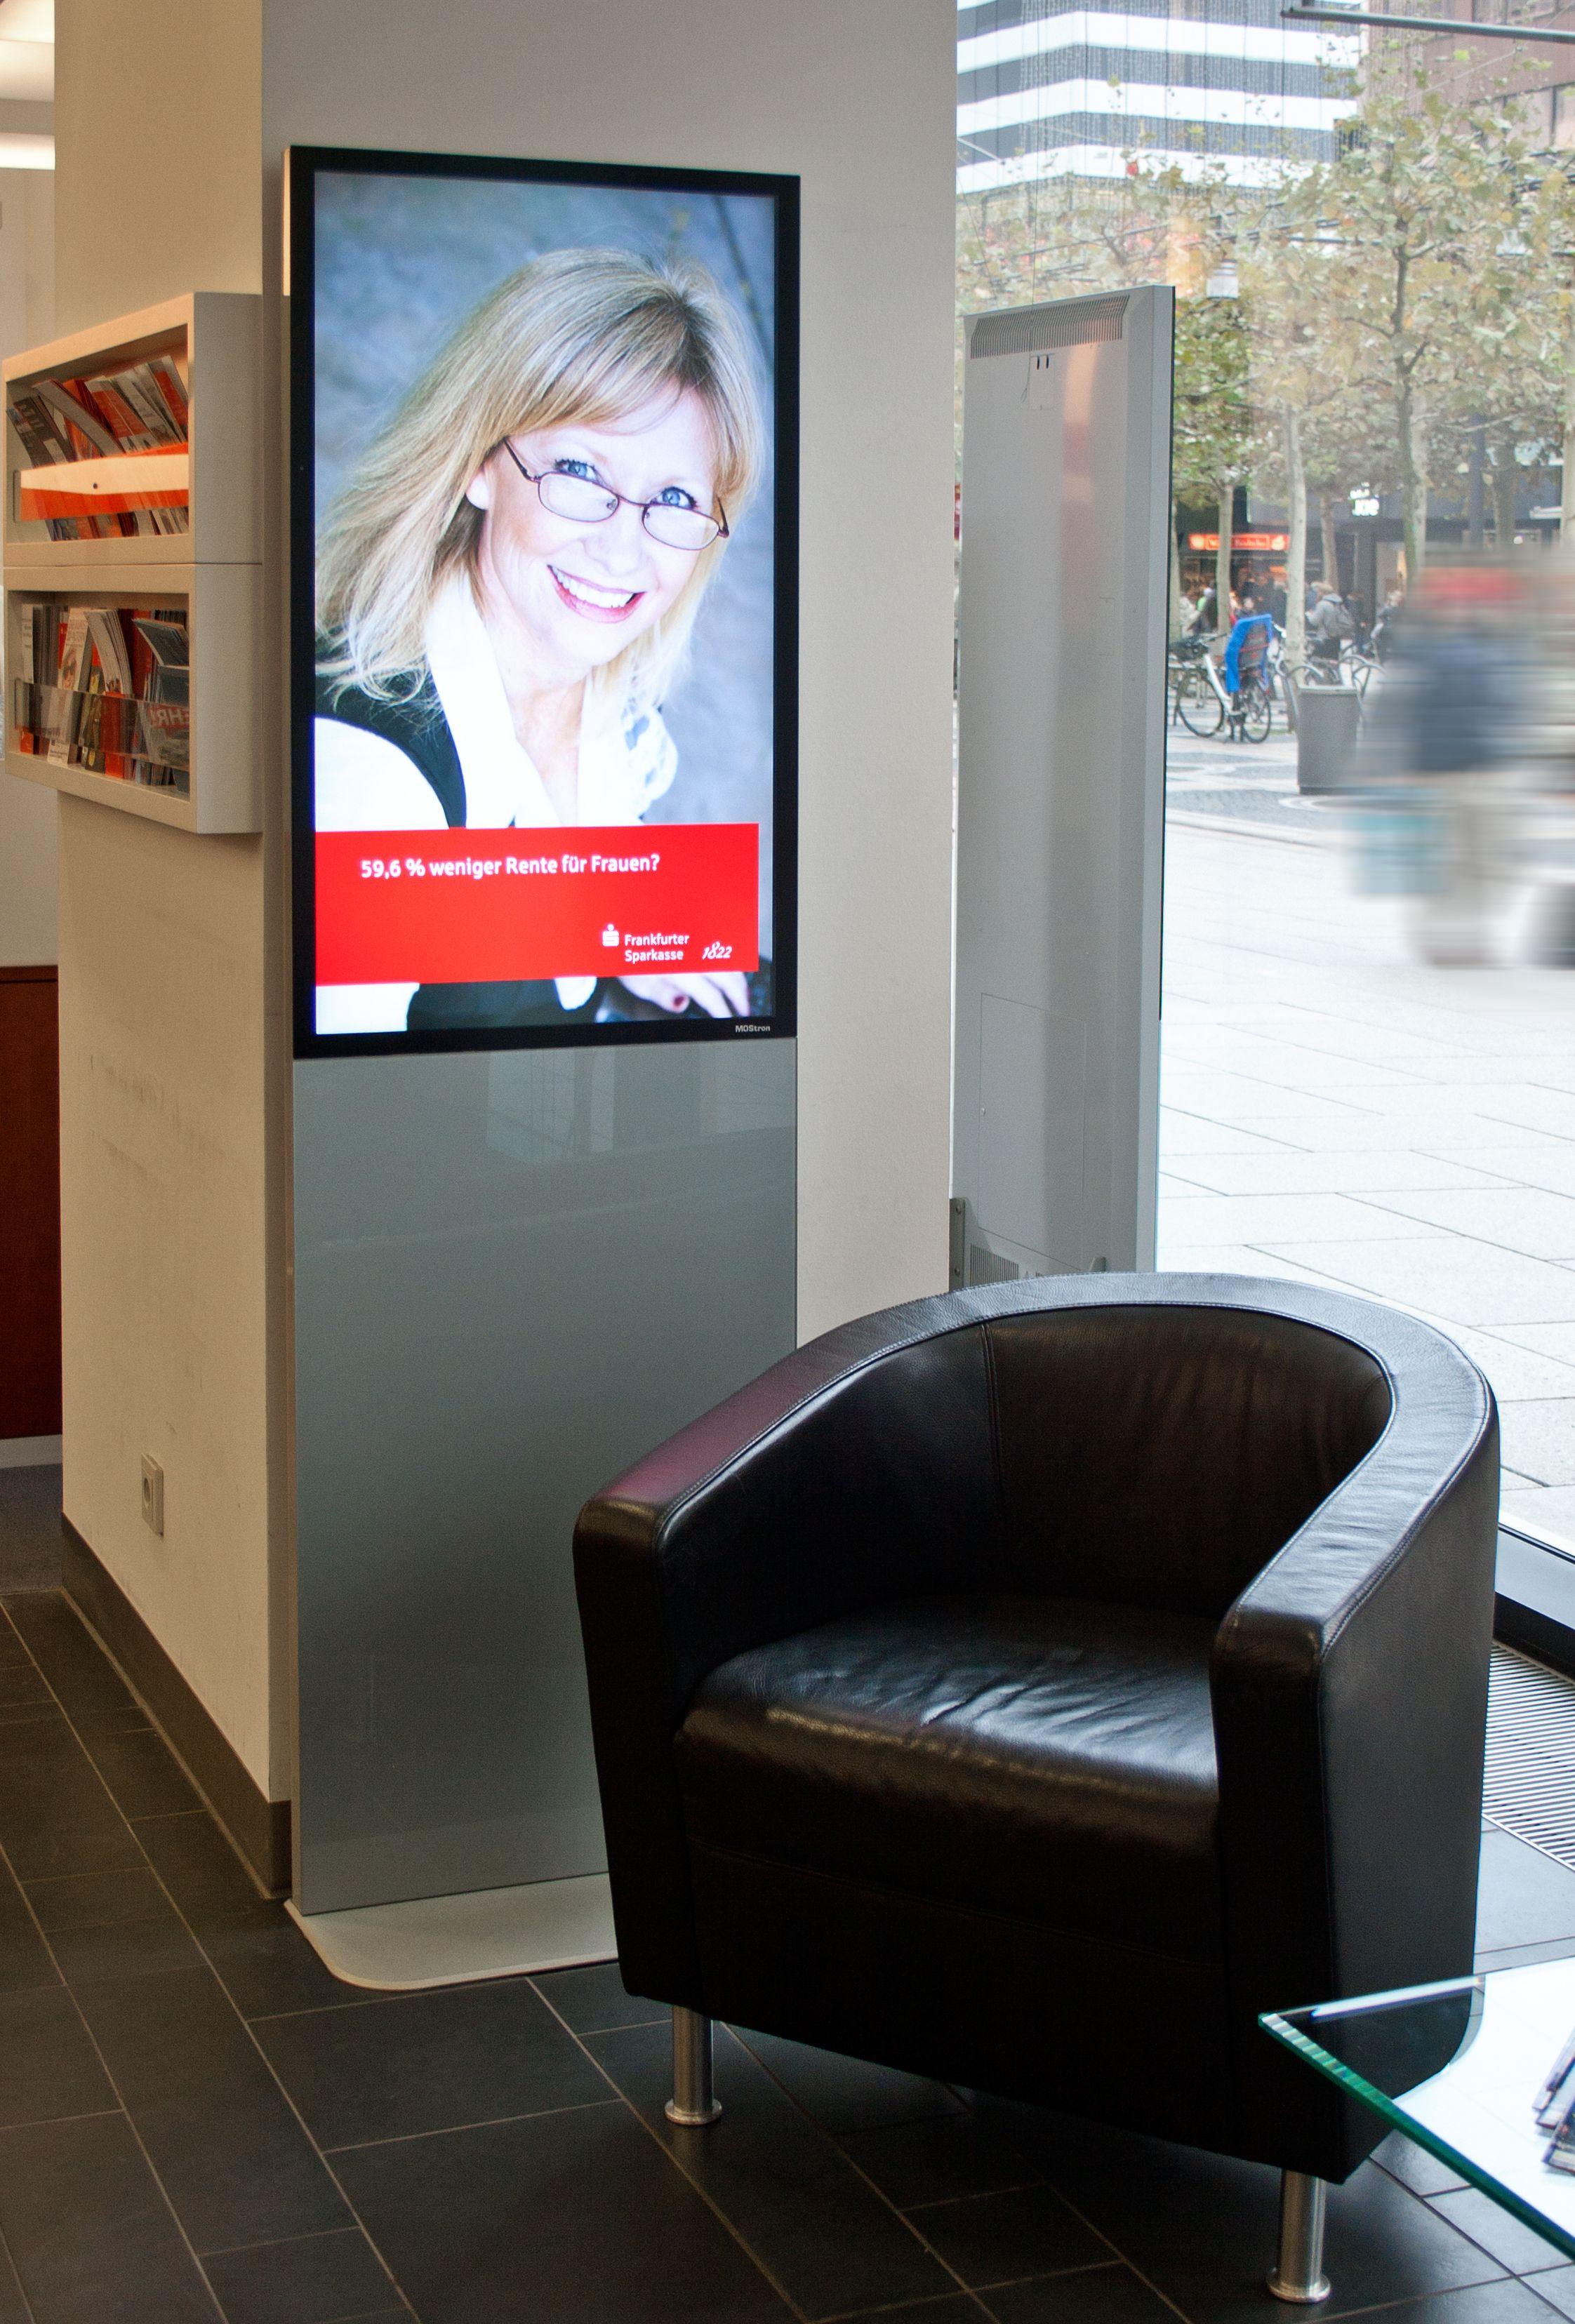 Referenz der komma,tec redaction: Design-Stelen in der Frankfurter Sparkasse.